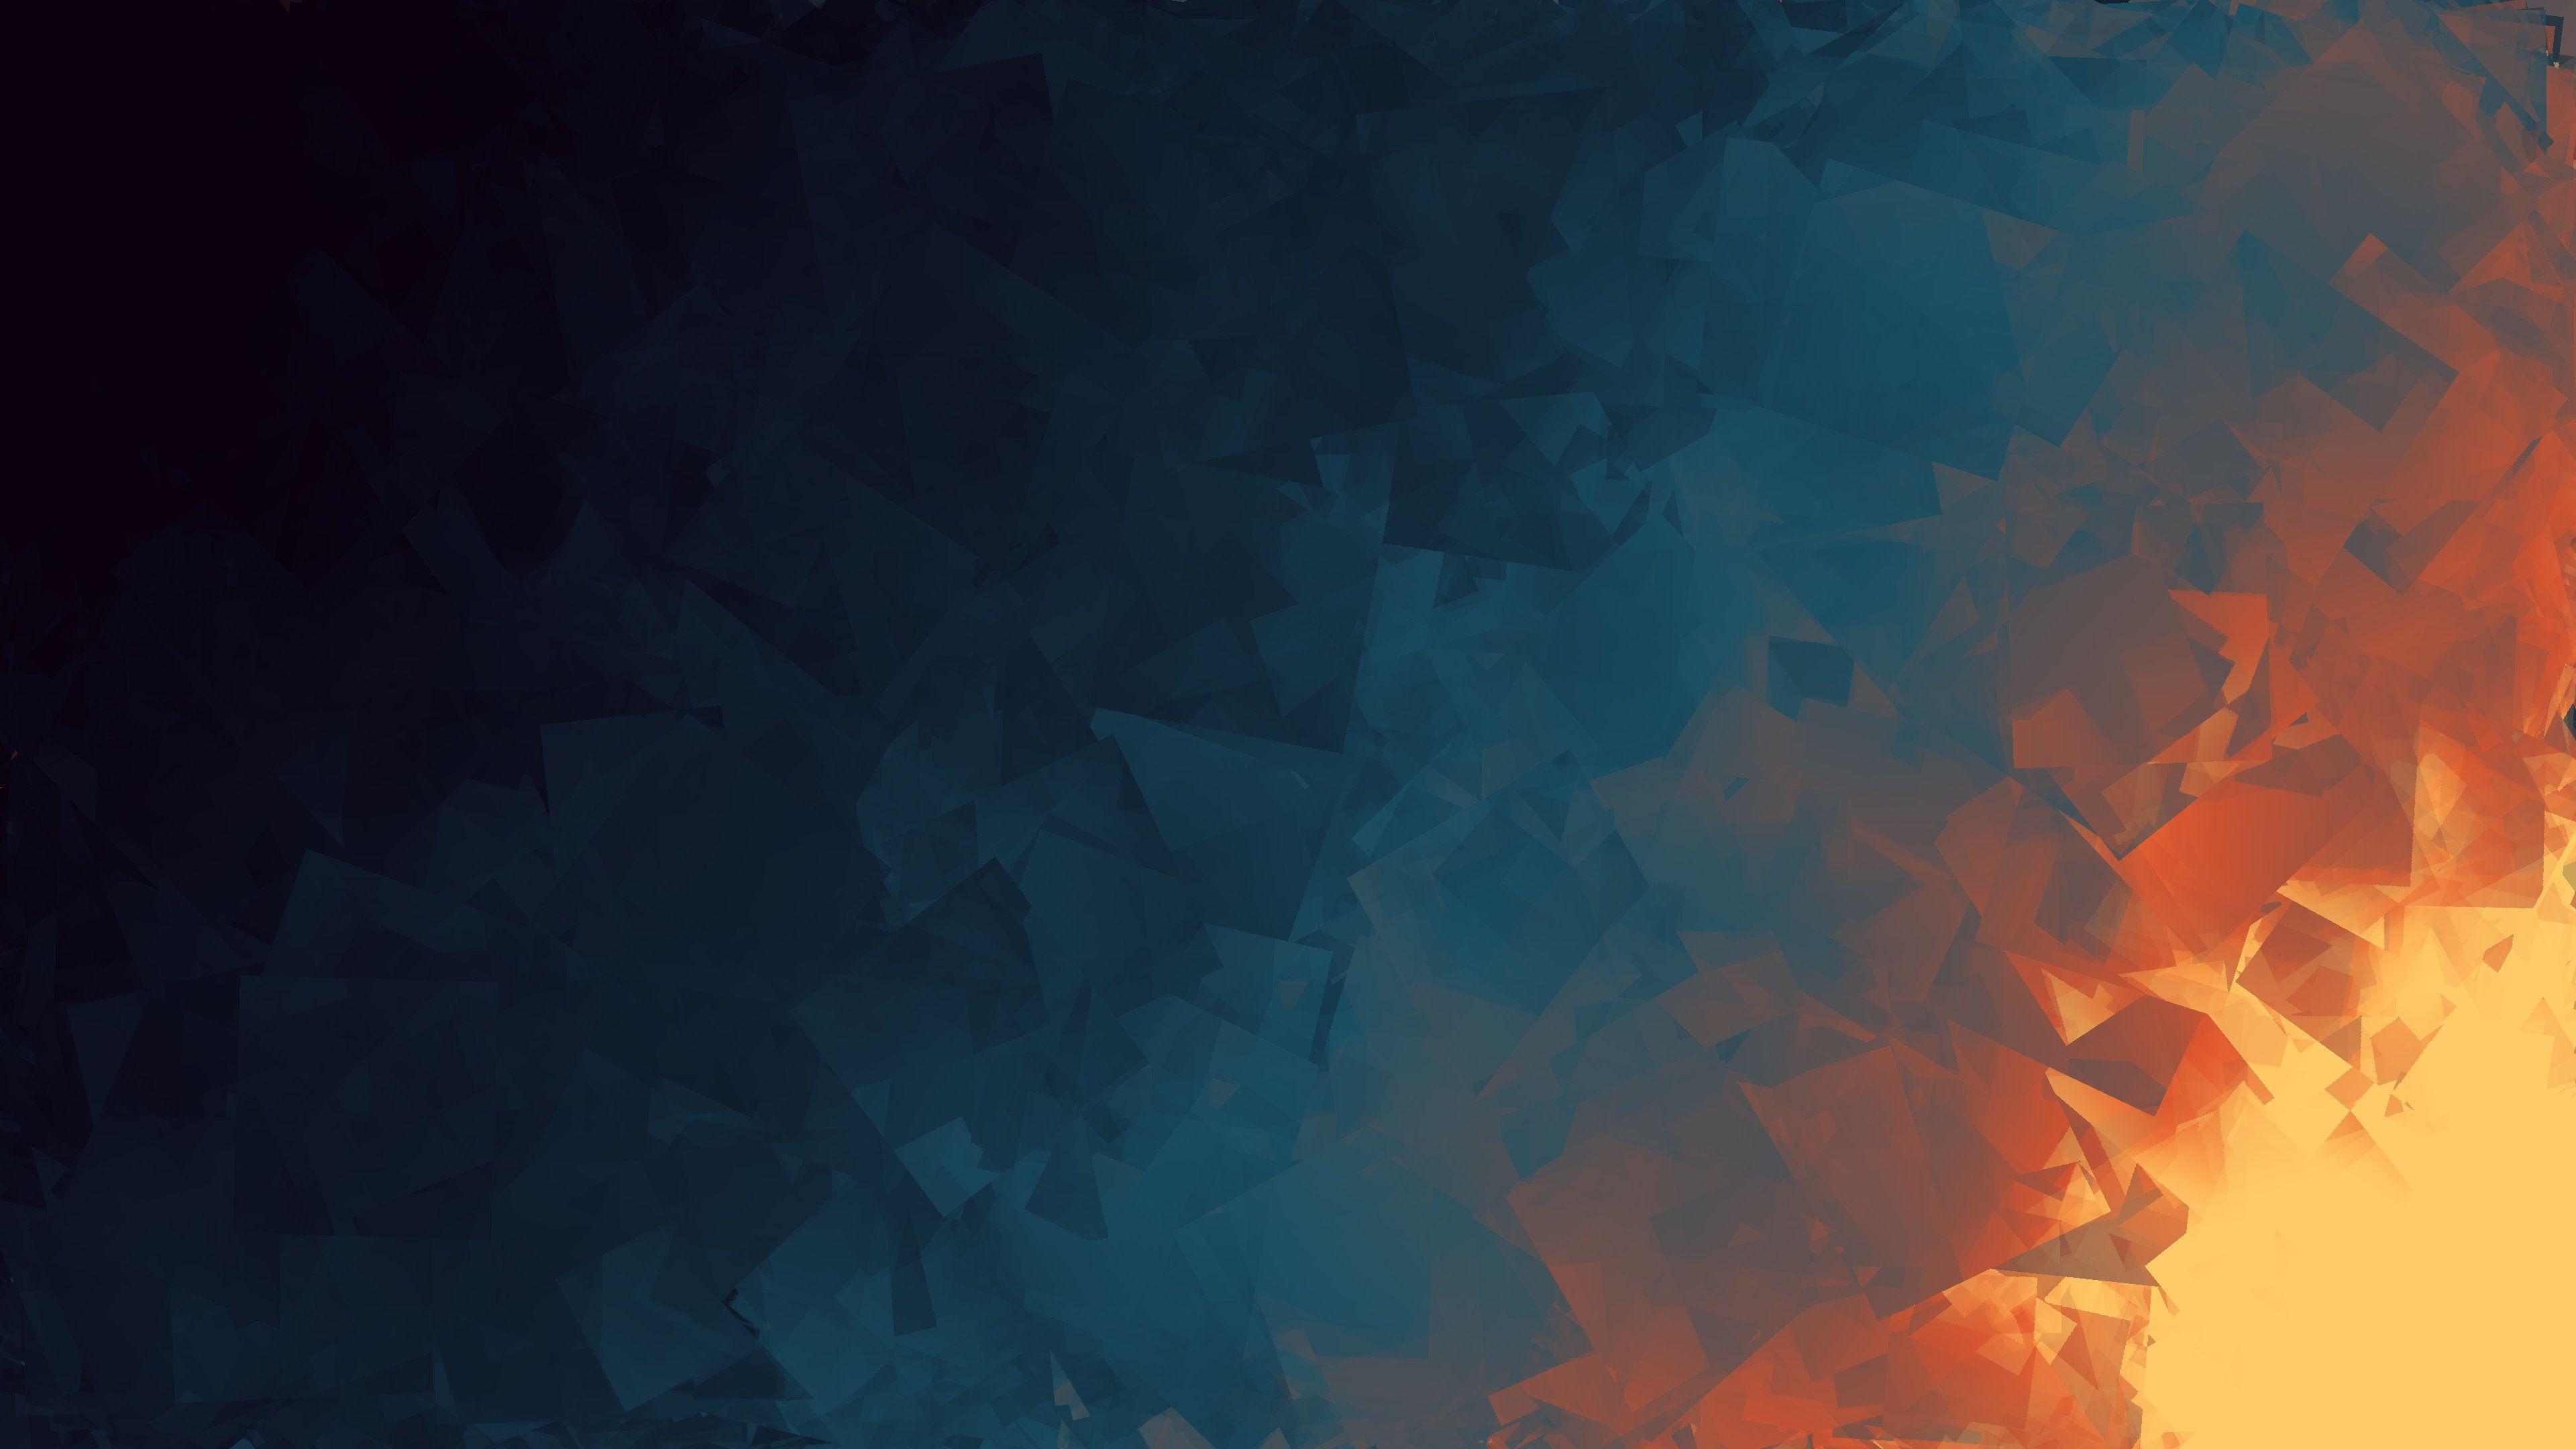 Small Memory Hd 4k Wallpaper: Top Free Art 4K Backgrounds